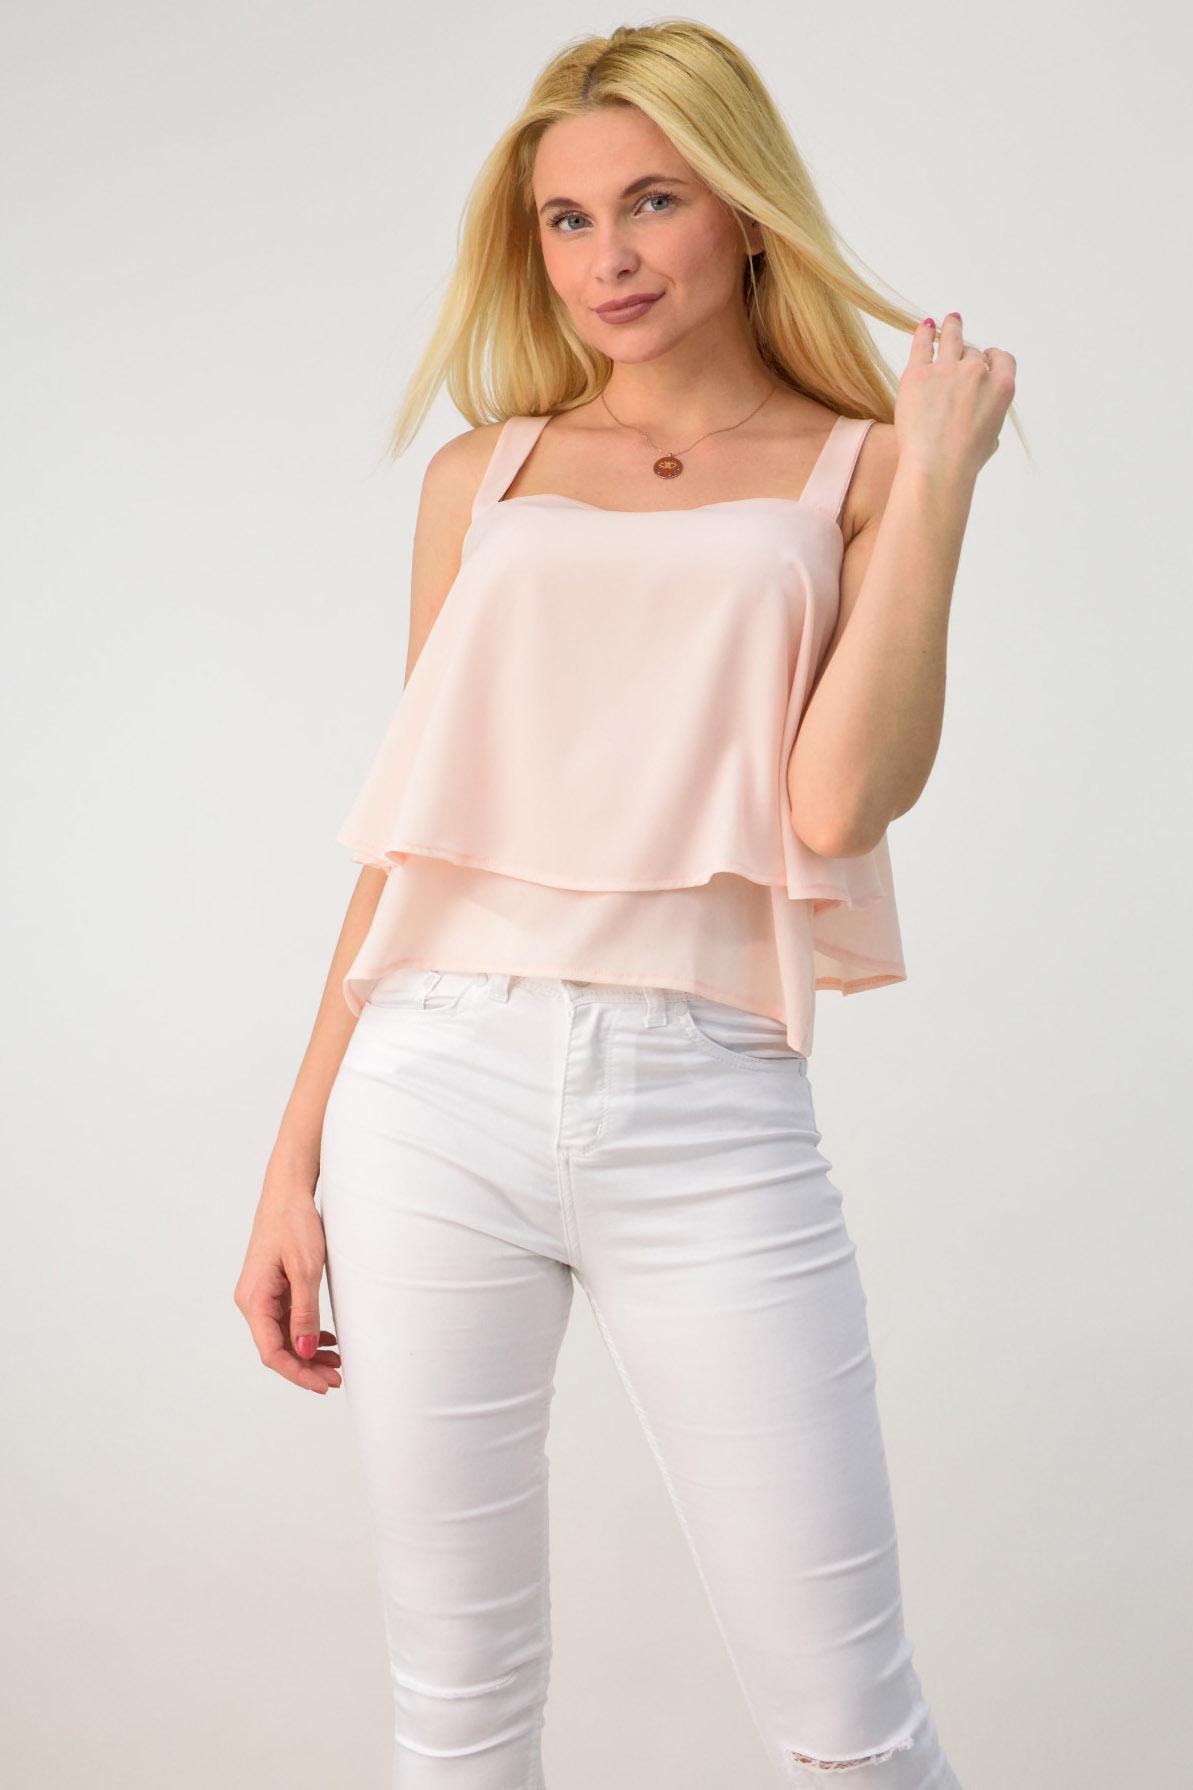 621ef05a1741 Γυναικεία μπλούζα με βολάν